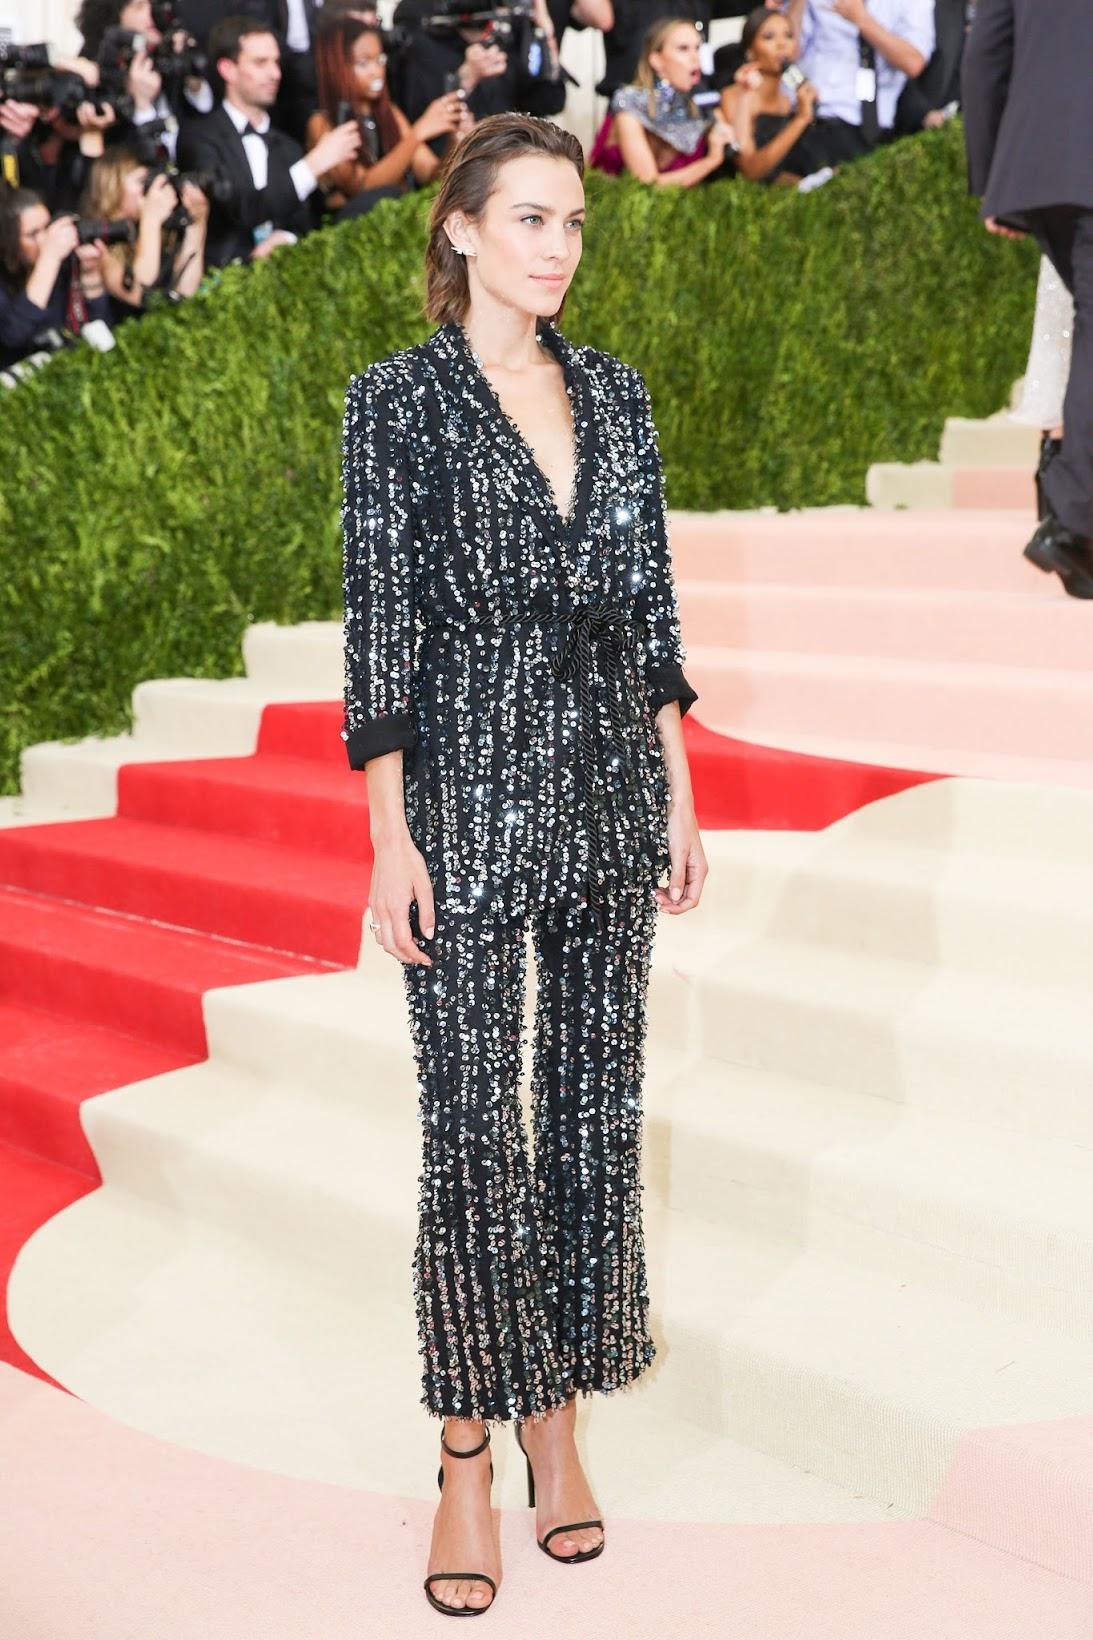 Best dressed at Met Gala 2016 | ManusXMachina, Alexa Chung Met Gala 2016 red carpet